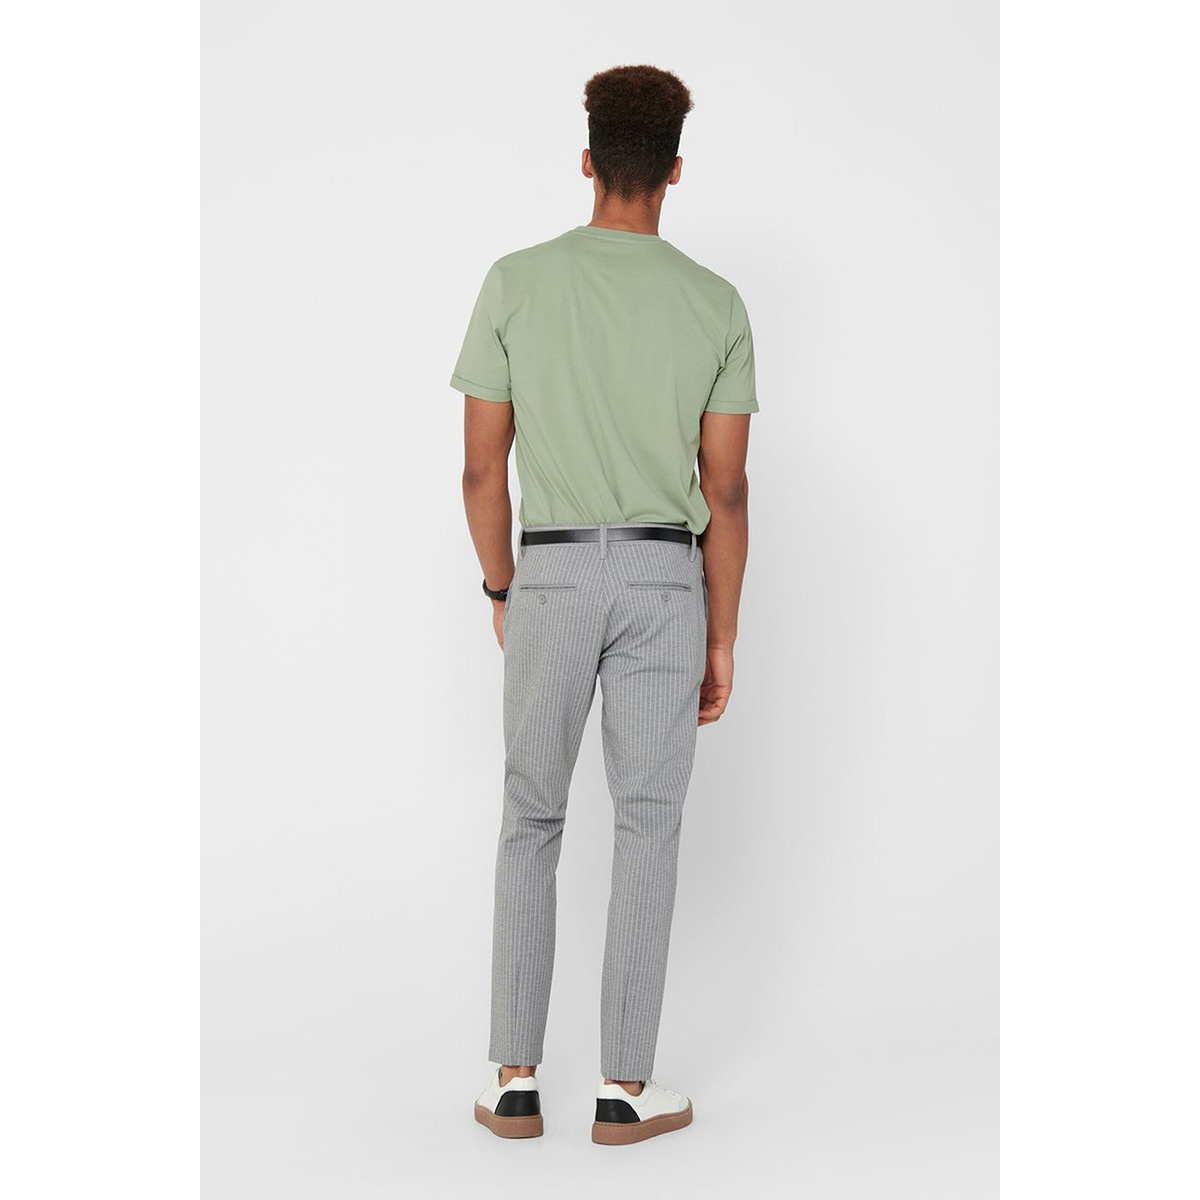 onsmark pant stripe gw 3727 noos 22013727 only & sons broek light grey melange